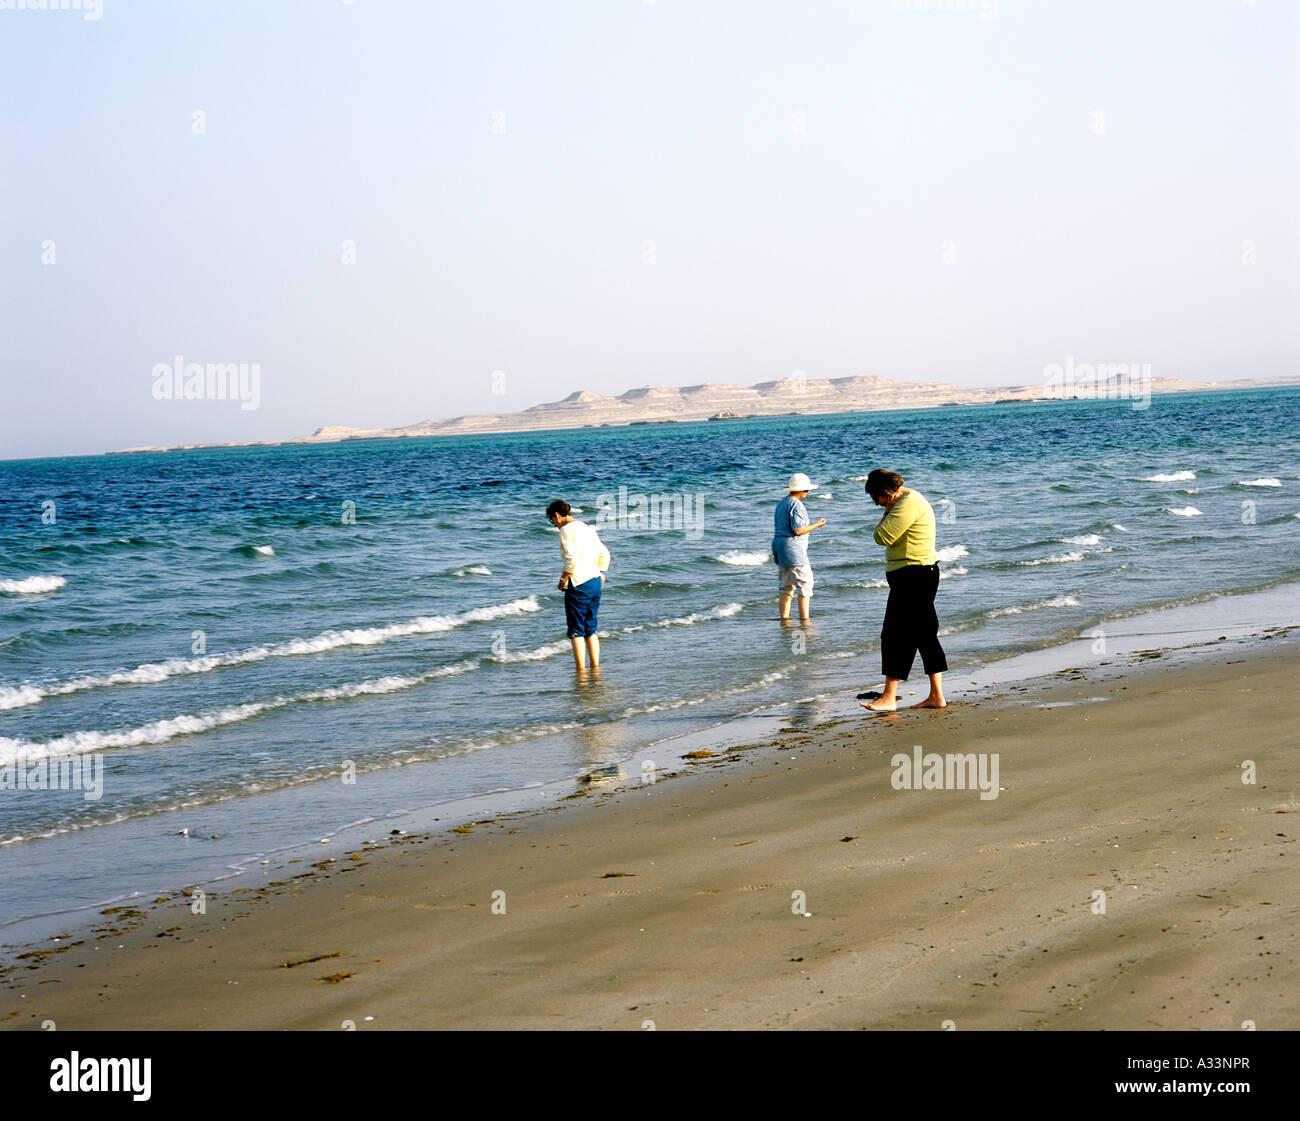 INLAND SEA SEPARATING QATAR AND SAUDI ARABIA - Stock Image